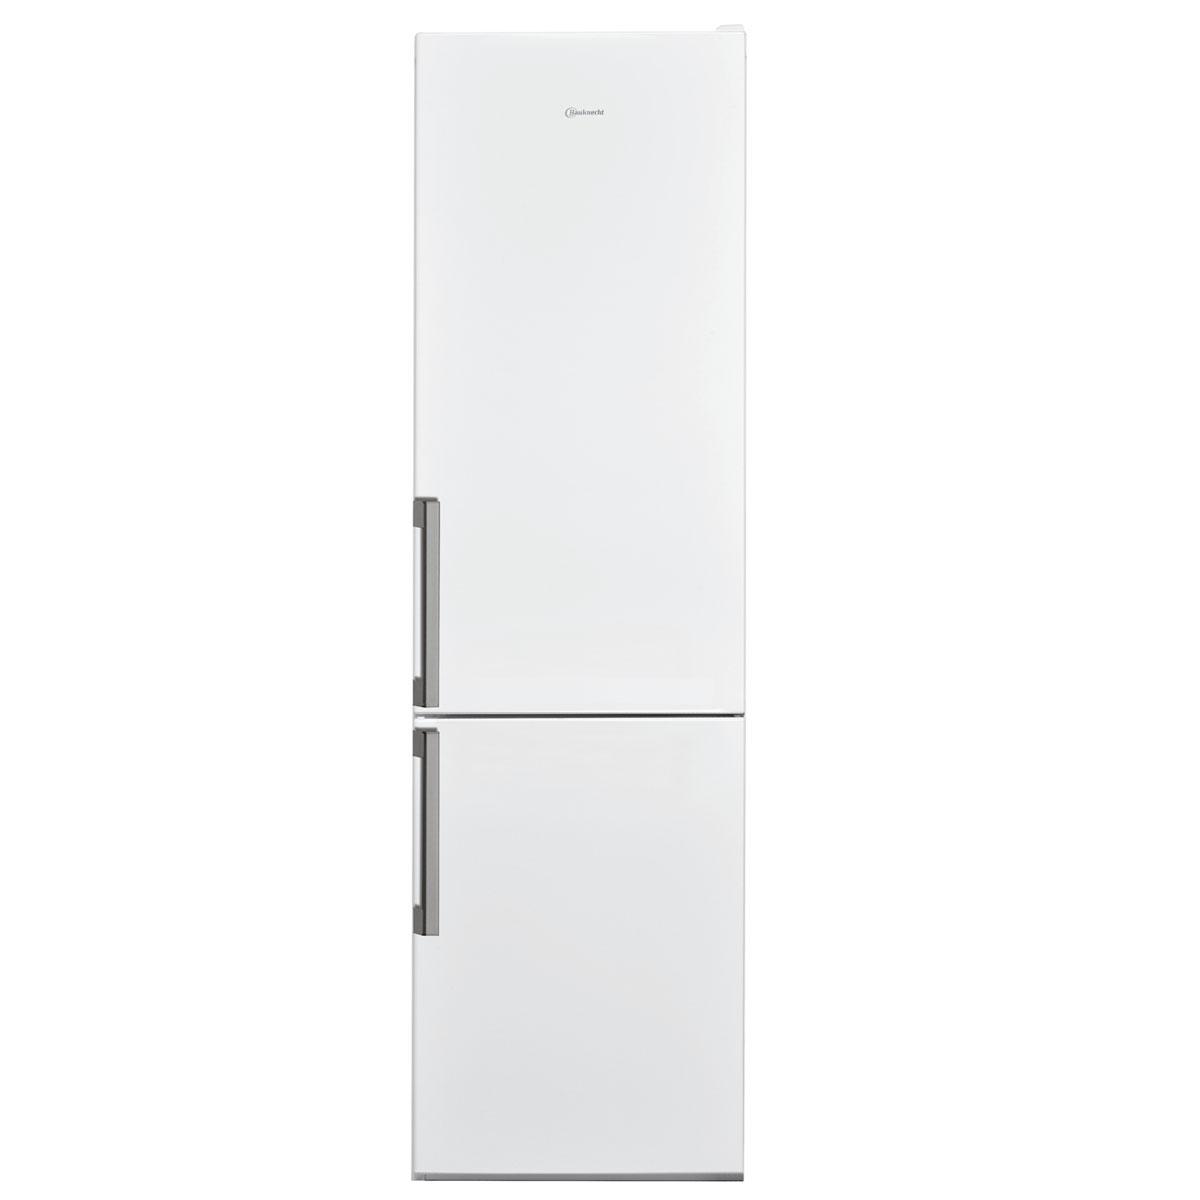 Bauknecht KGLF17A2+WS Kühl-/Gefrierkombi A++ Kühl-Gefrierkombination Kühlschrank